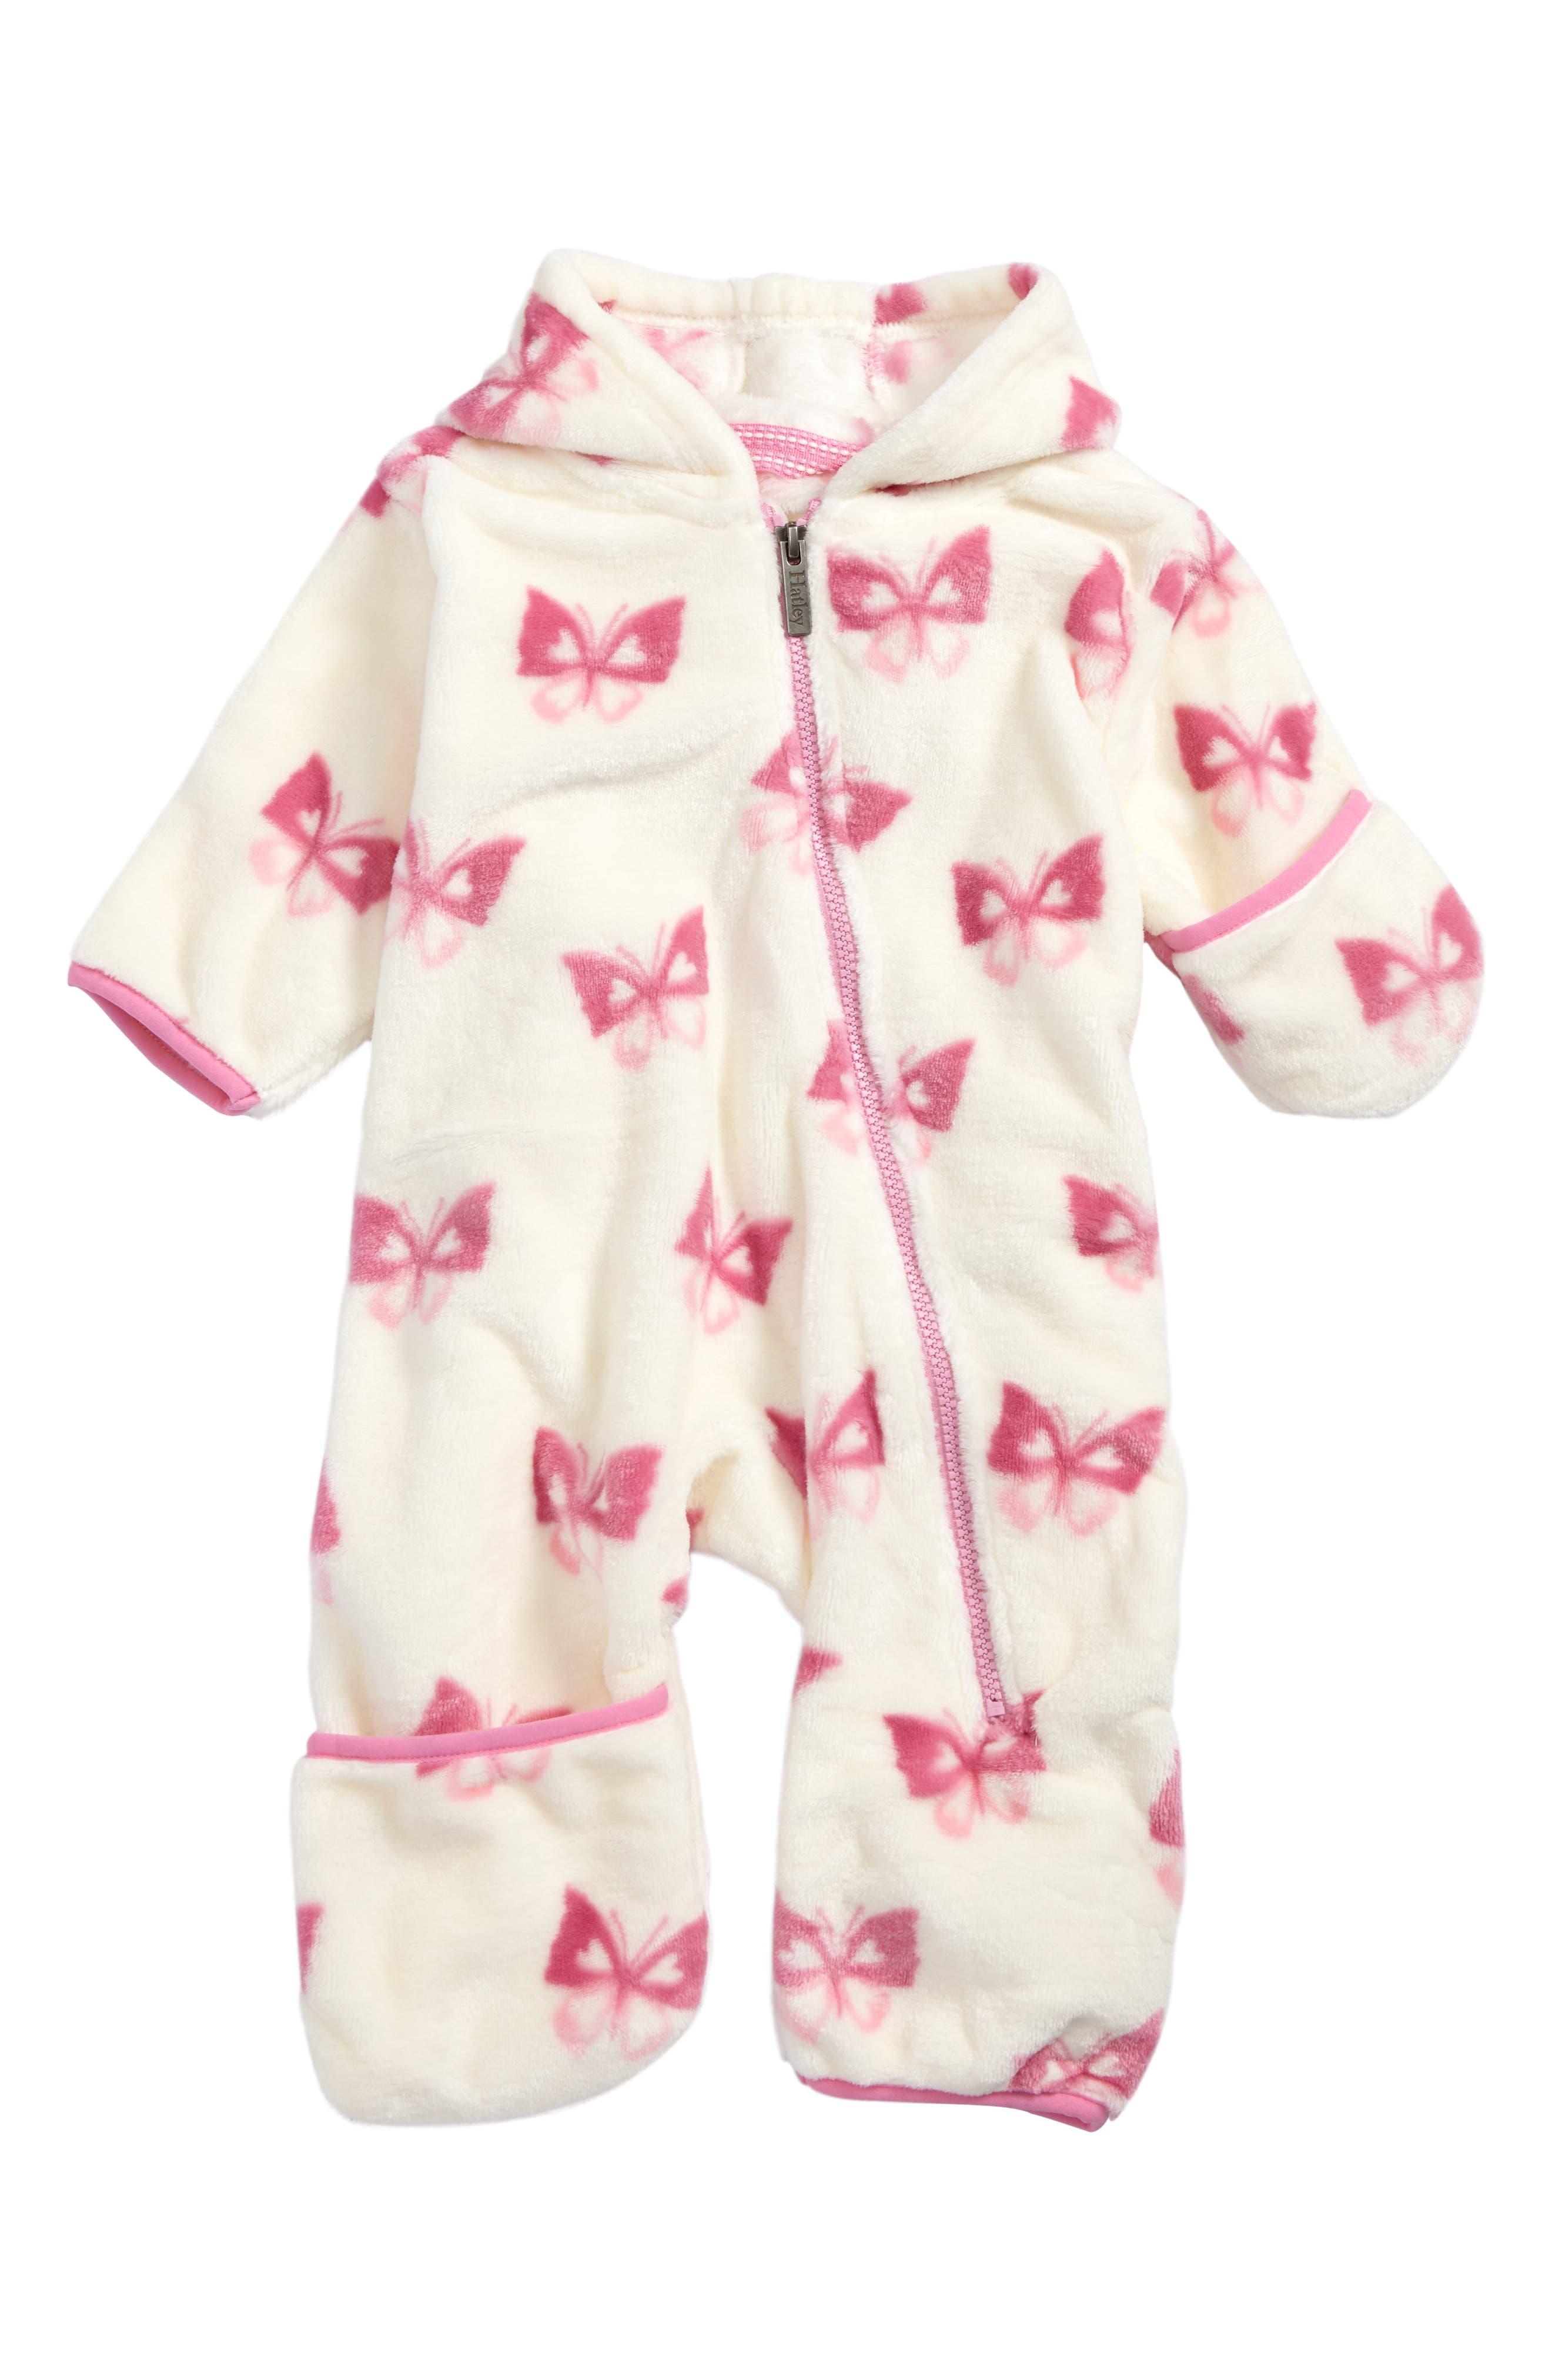 Hatley Fuzzy Fleece Bundlers Snowsuit (Baby)